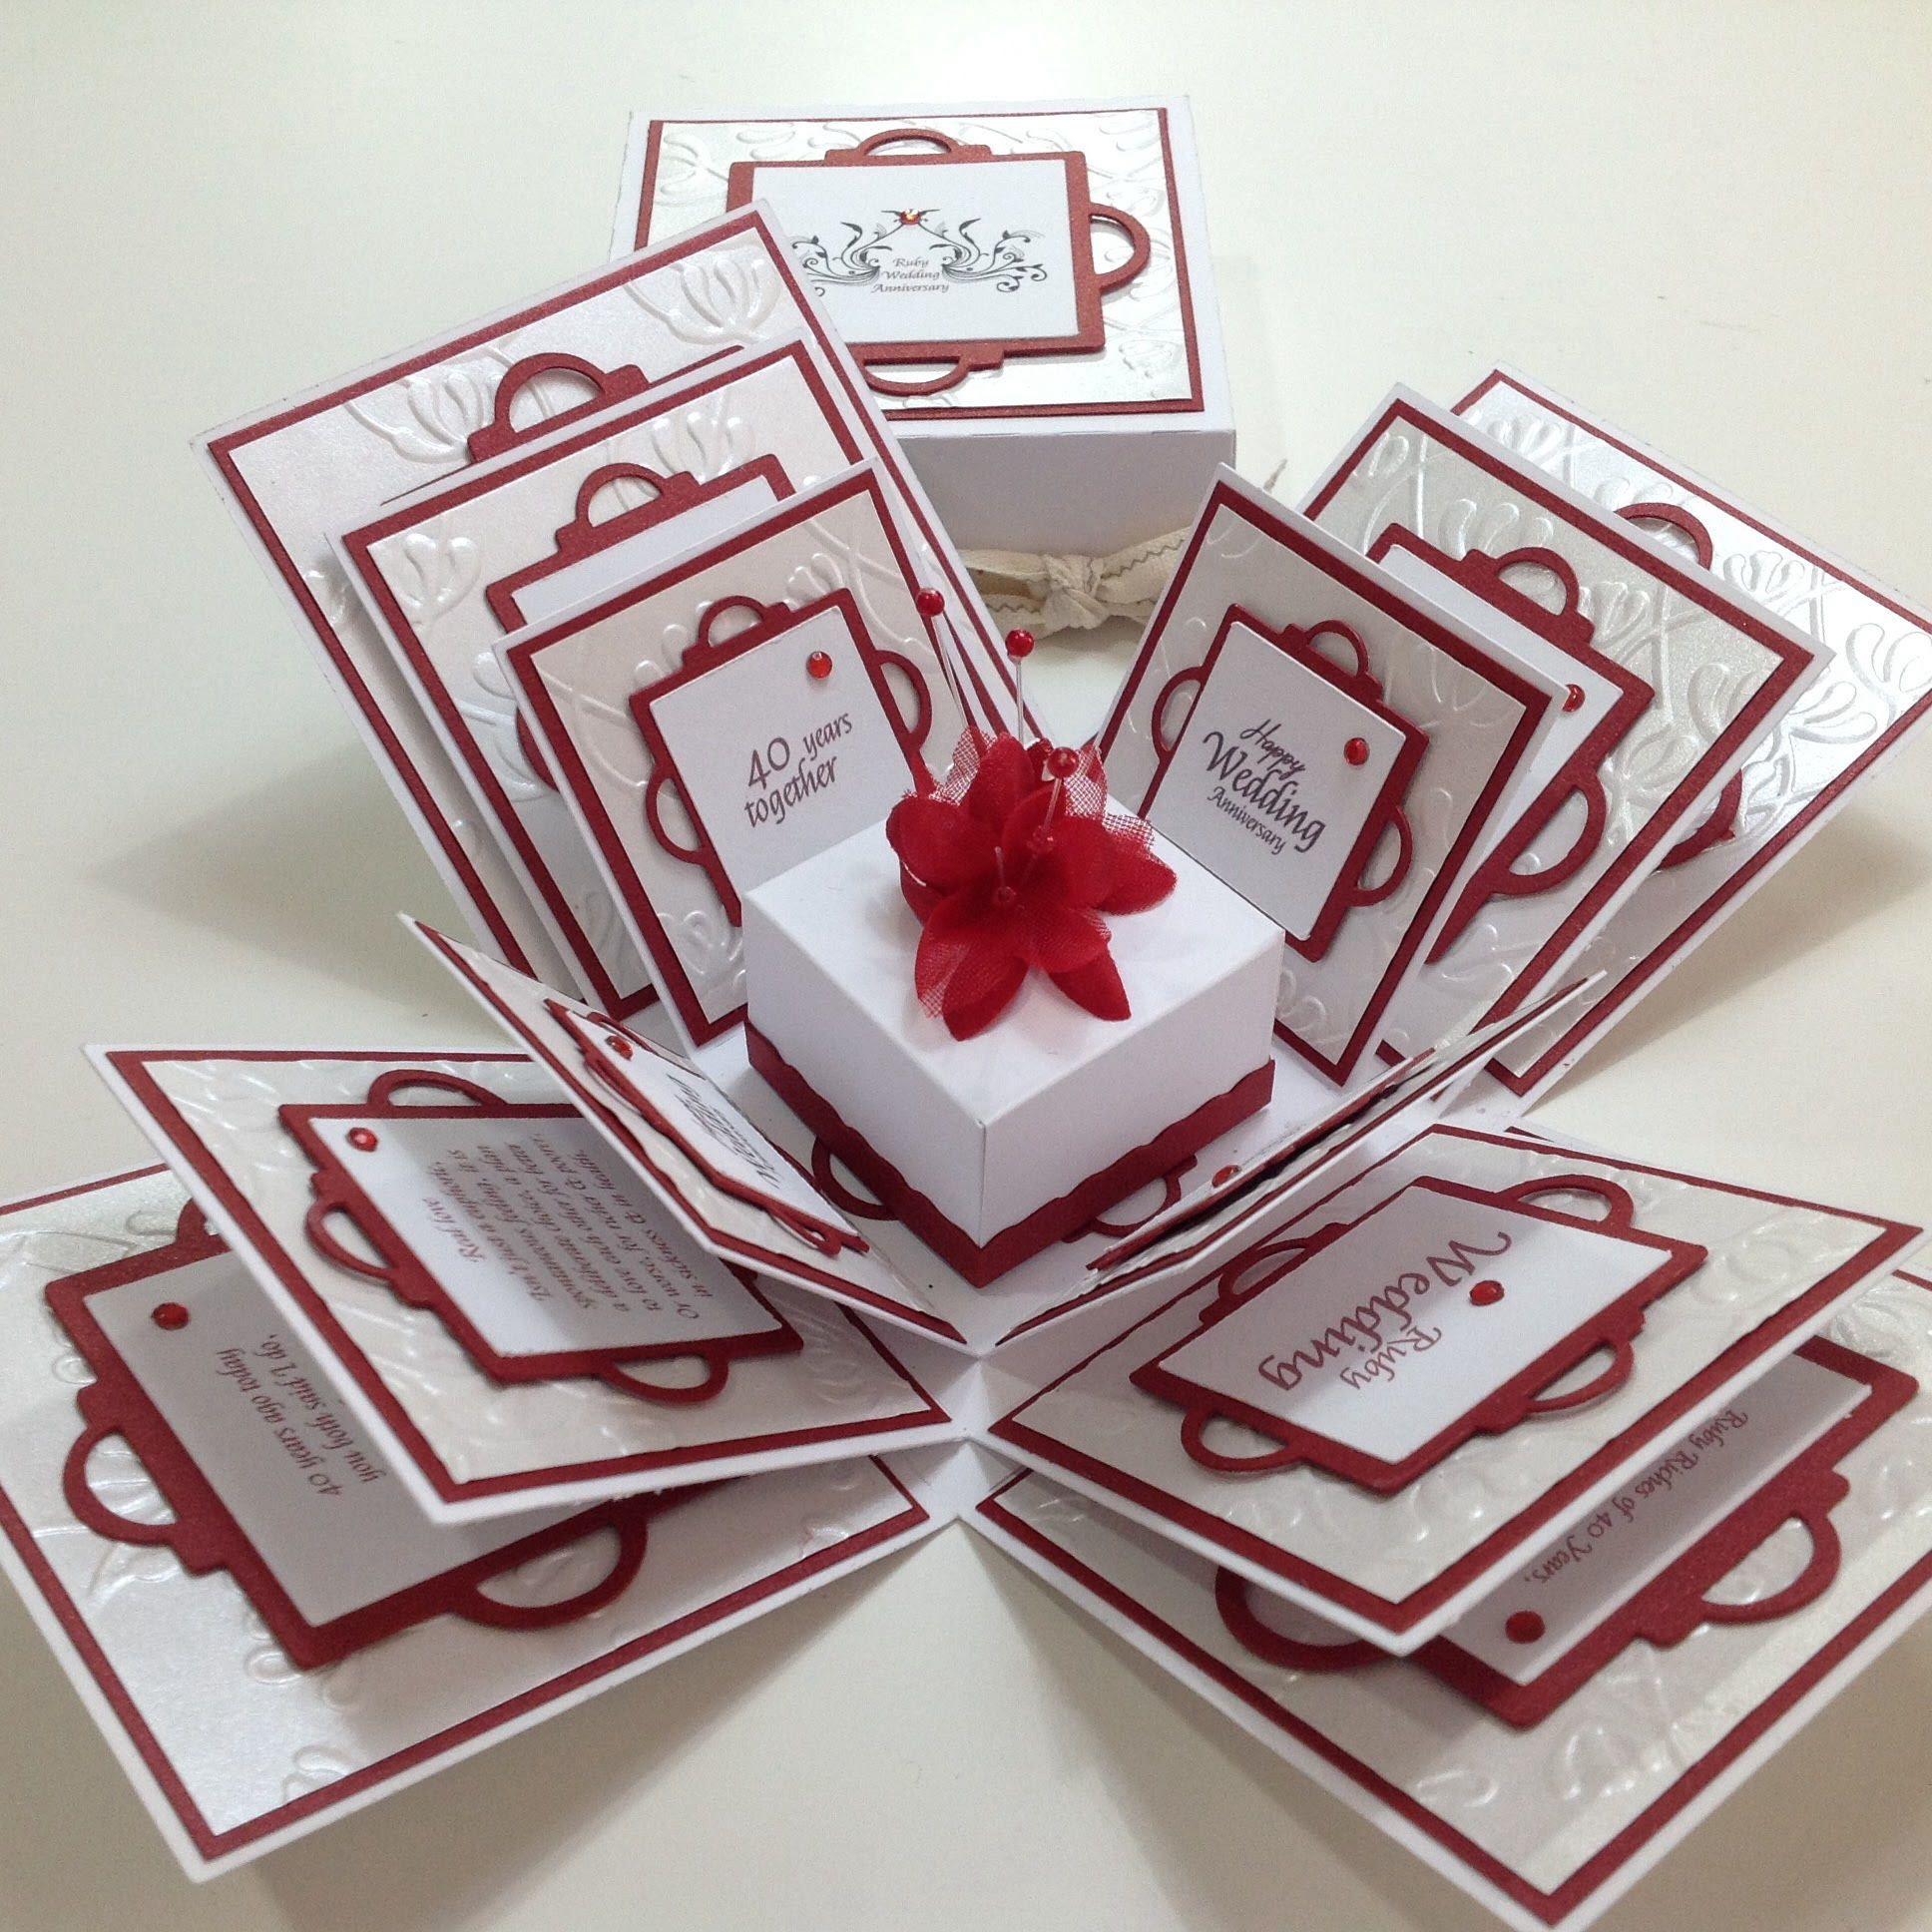 Exploding 40th ruby wedding anniversary box card